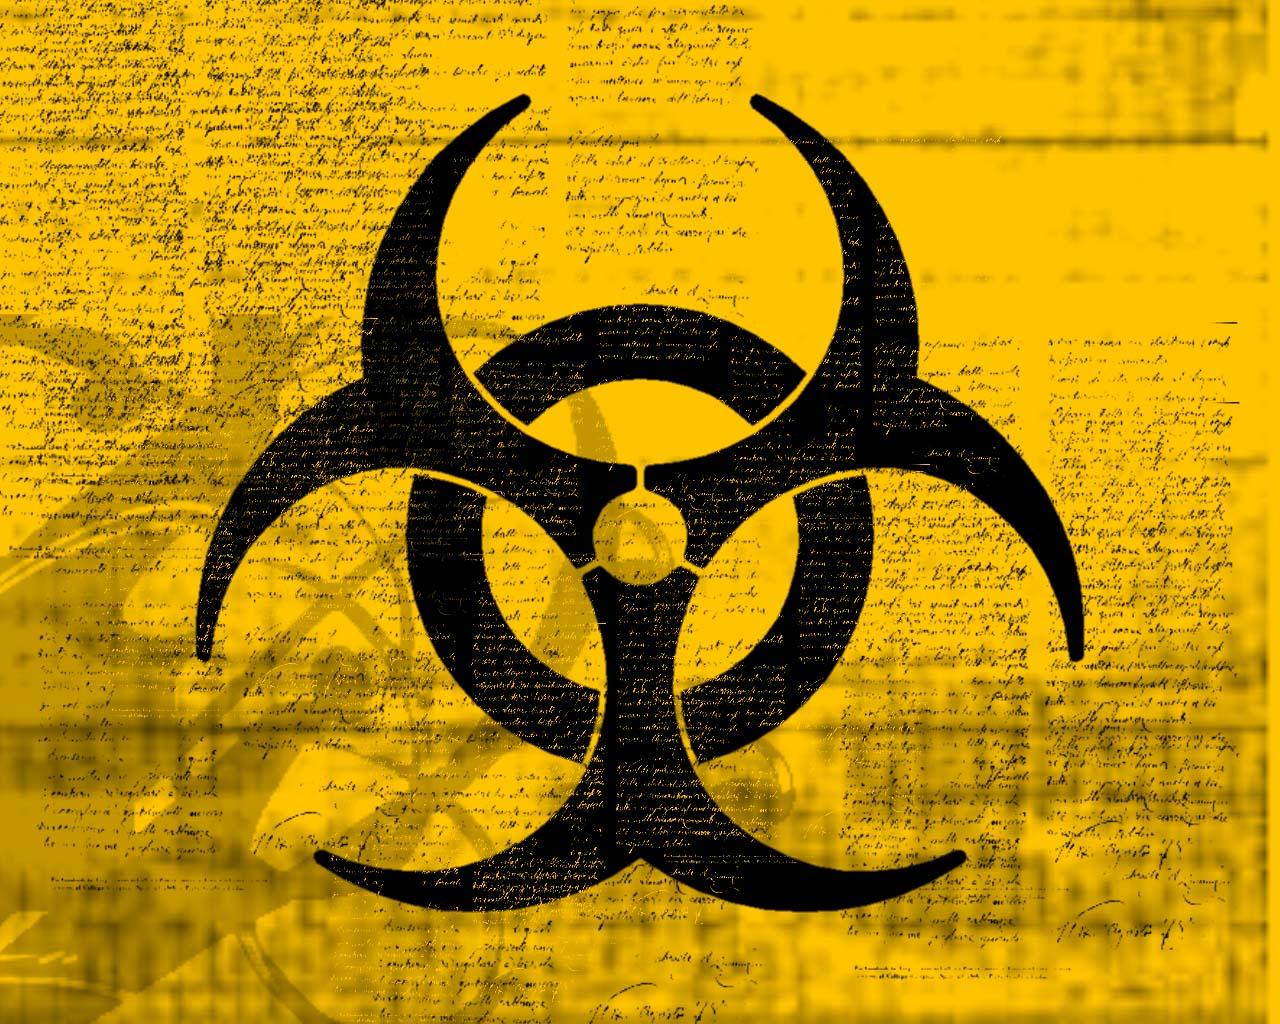 Du dark mtal lEspace Culturel Andr Malraux avec Biohazard c 1280x1024